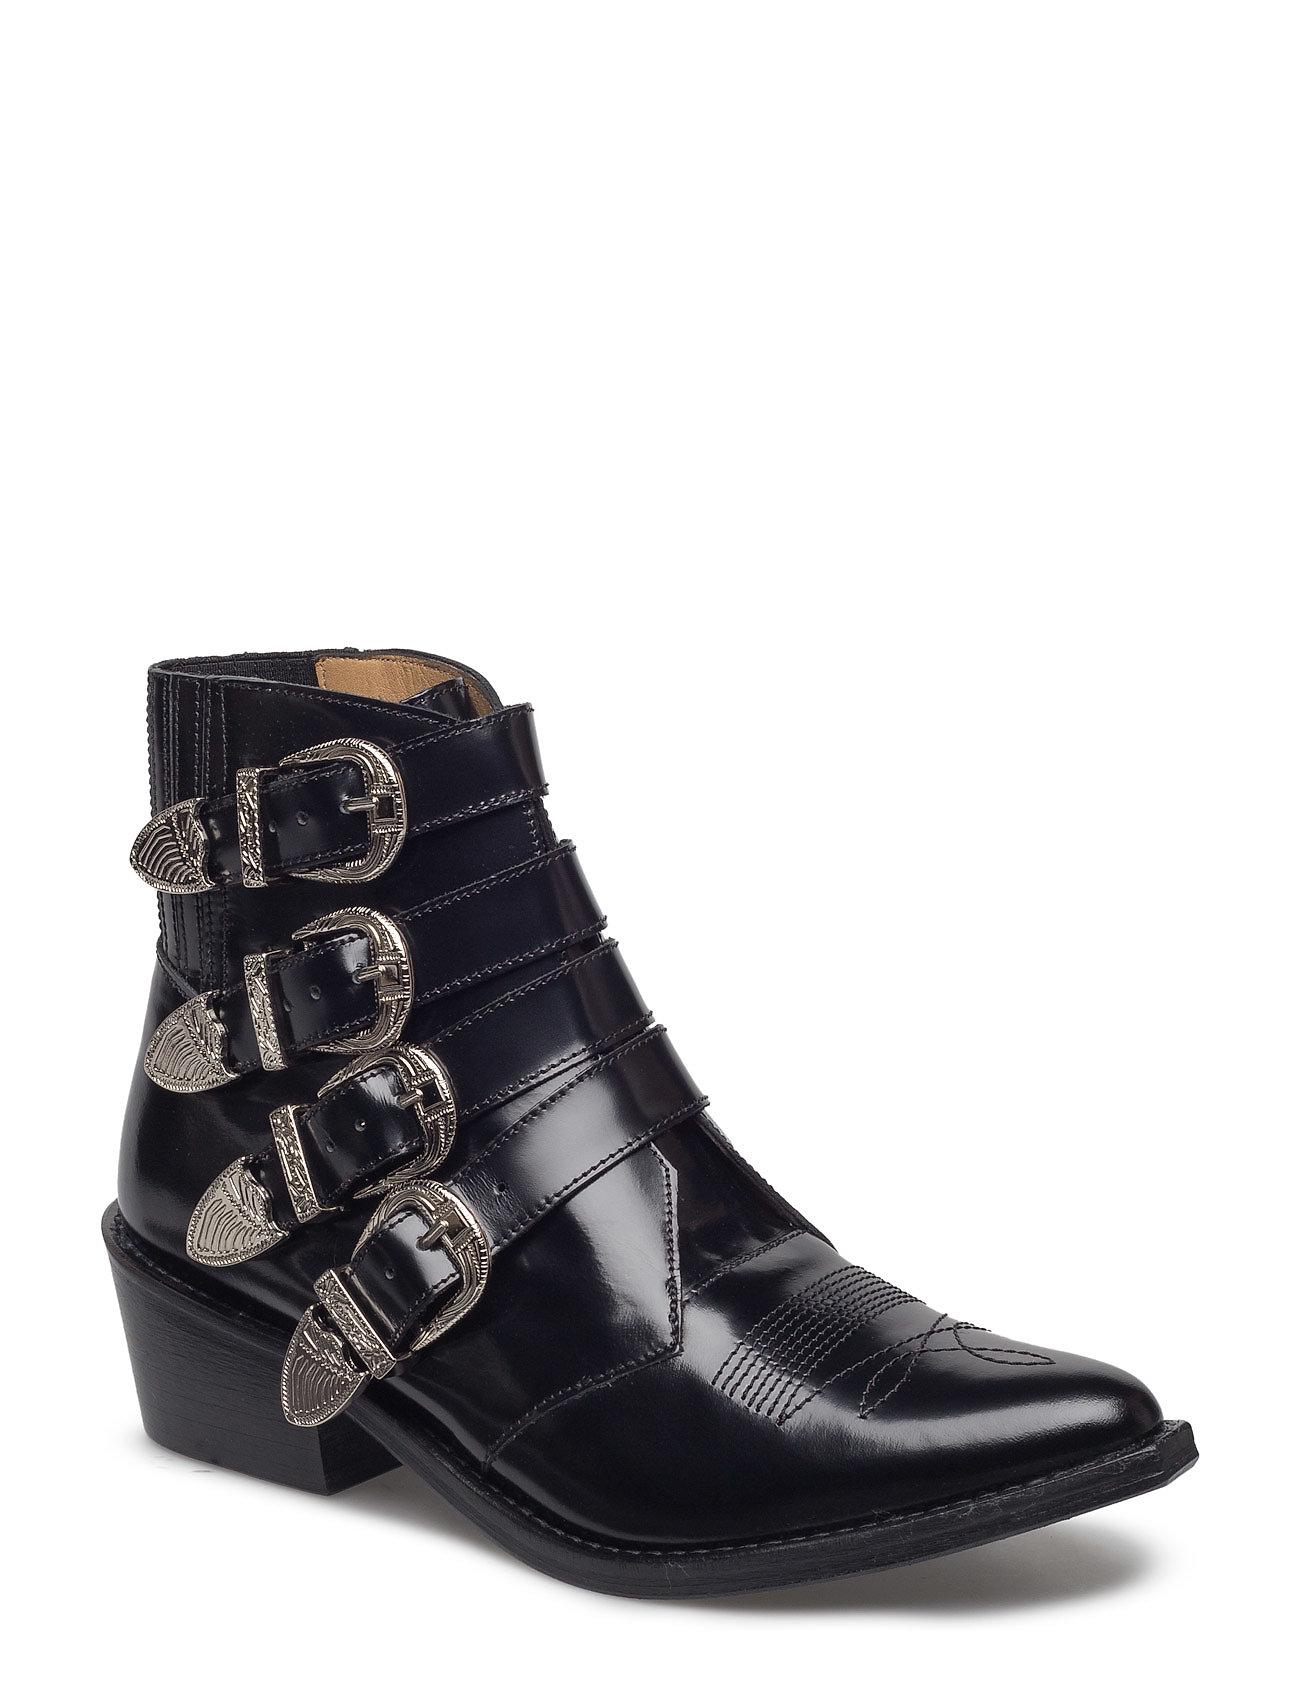 Toga Pulla Toga Pulla - Boots